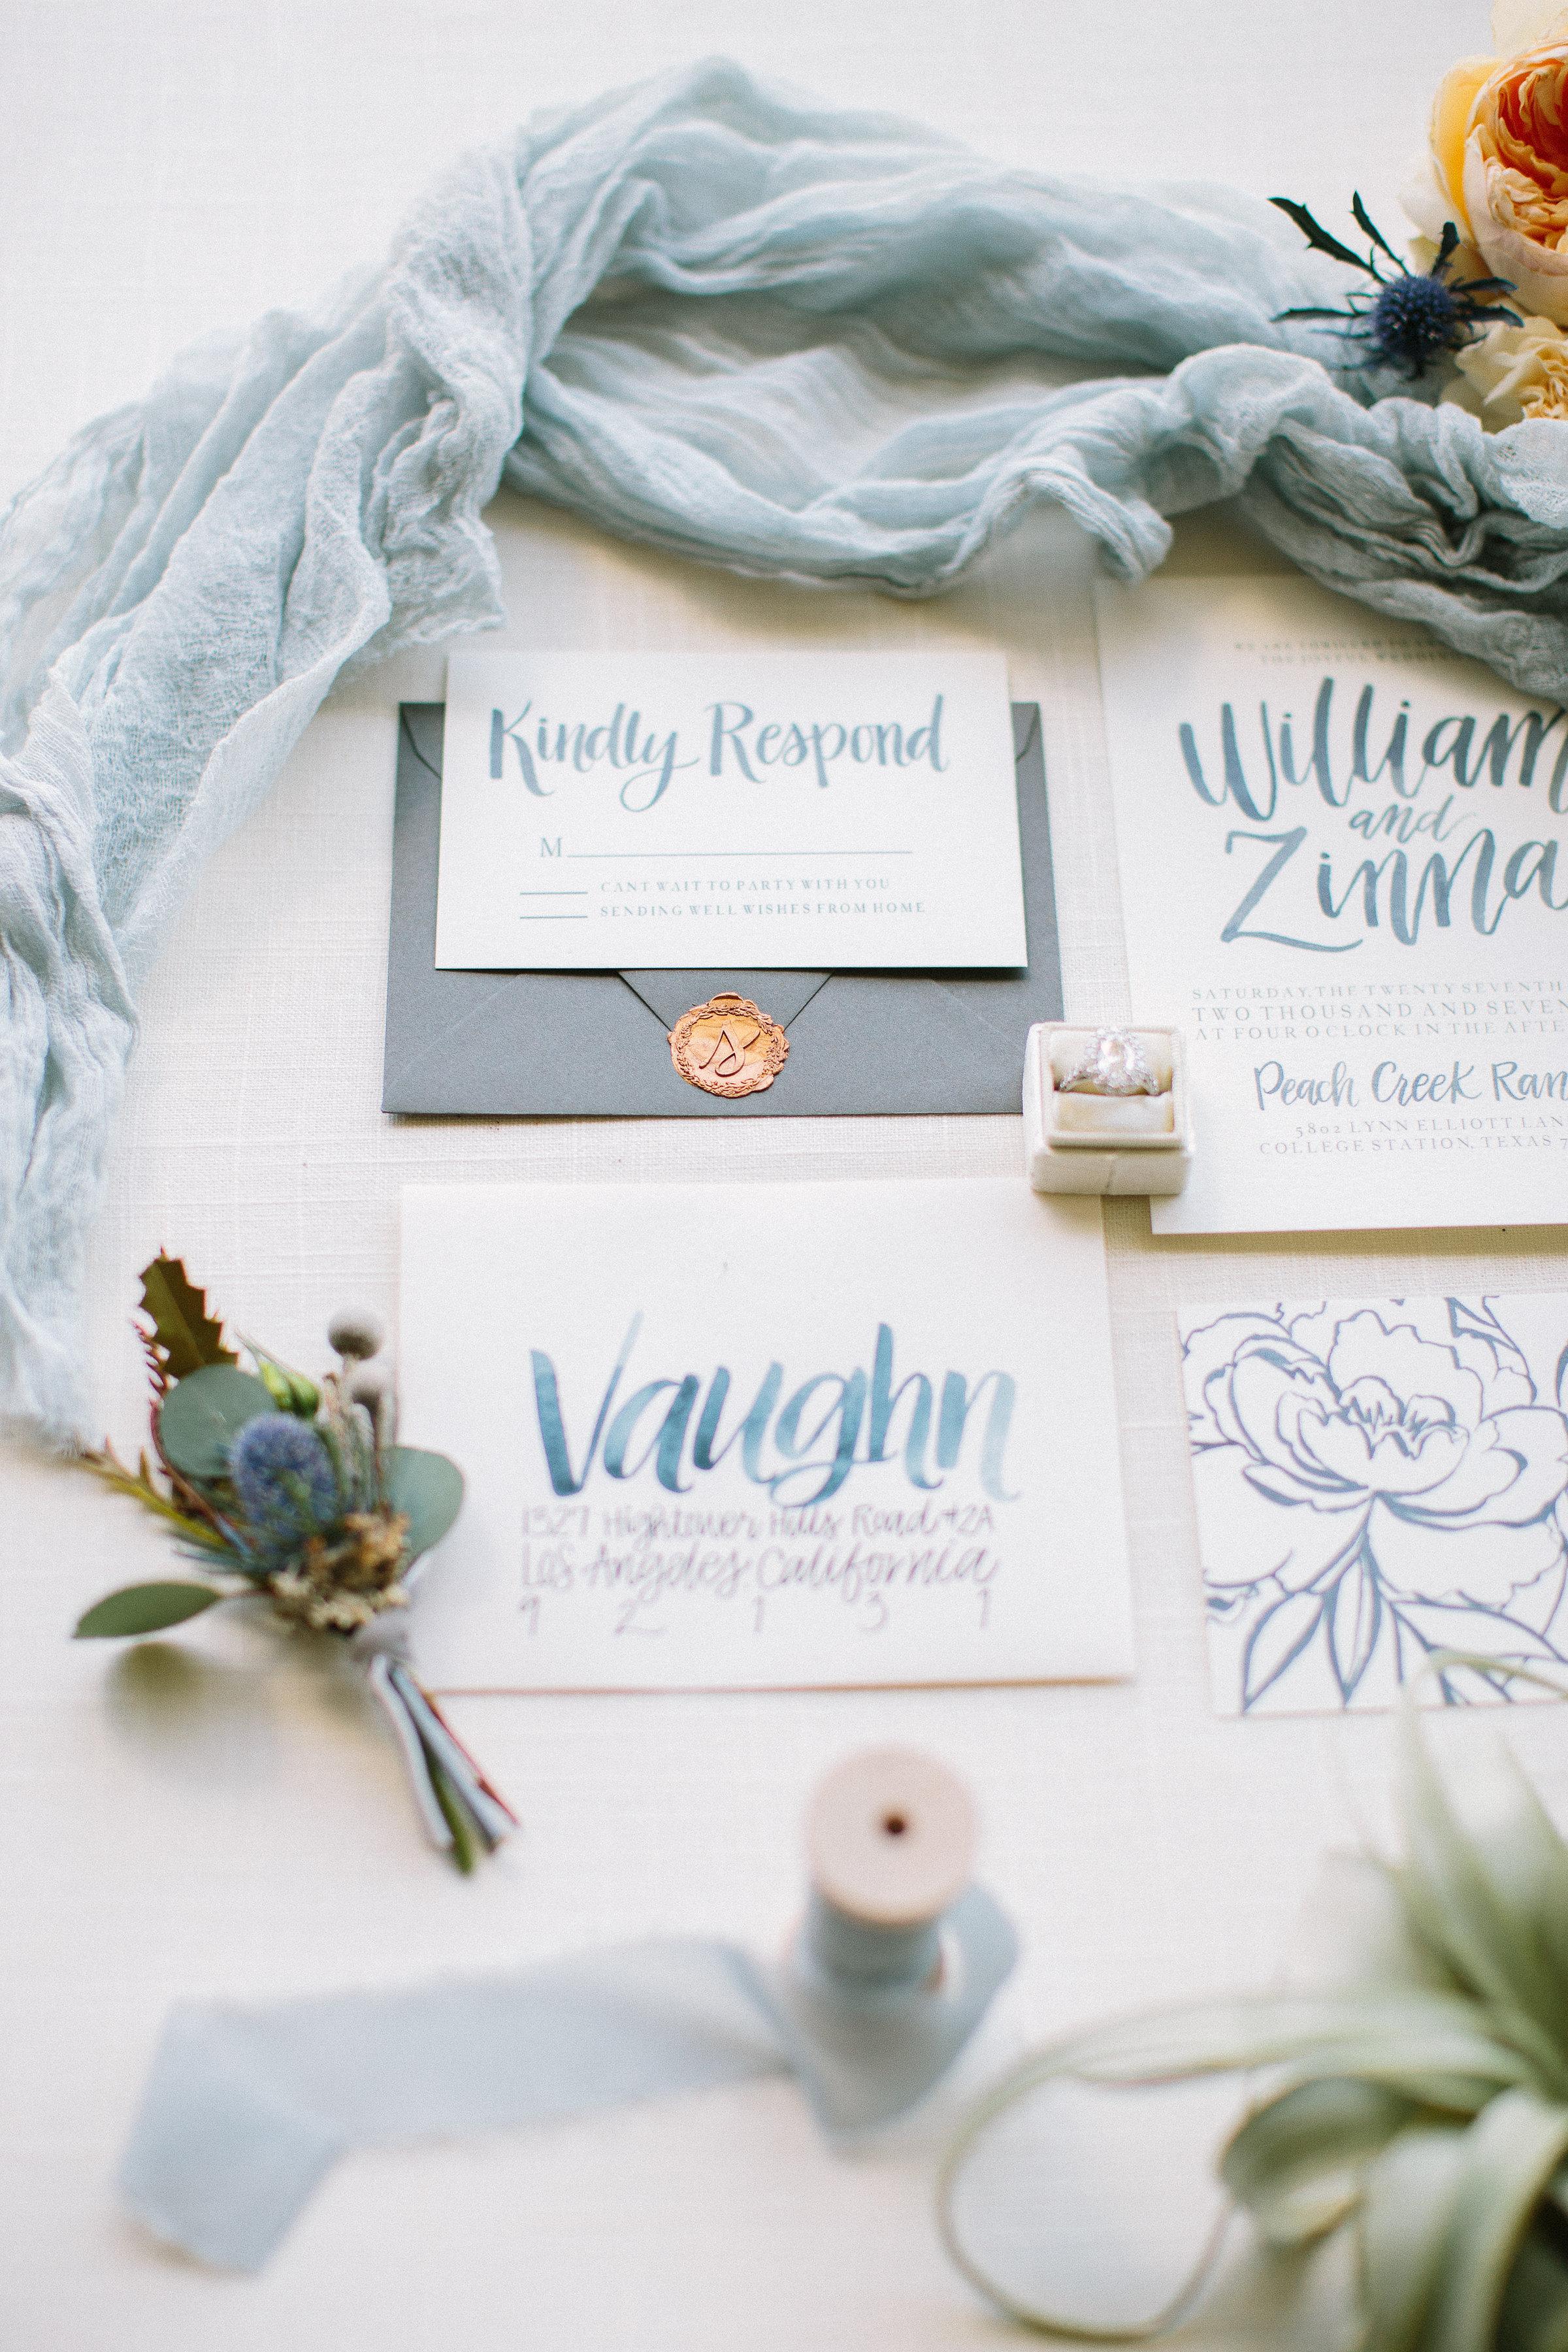 Ellen-Ashton-Photography-Peach-Creek-Ranch-Weddings-Wed-and-Prosper7